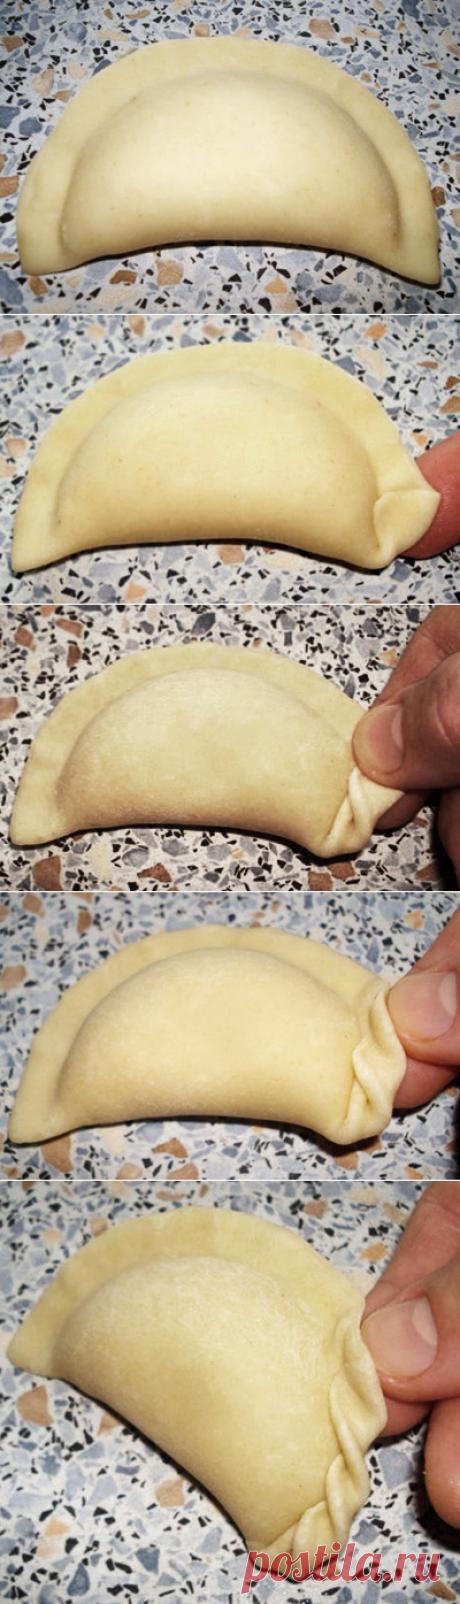 We learn to mold beautiful vareniki, pelmeni, a kurza and.....